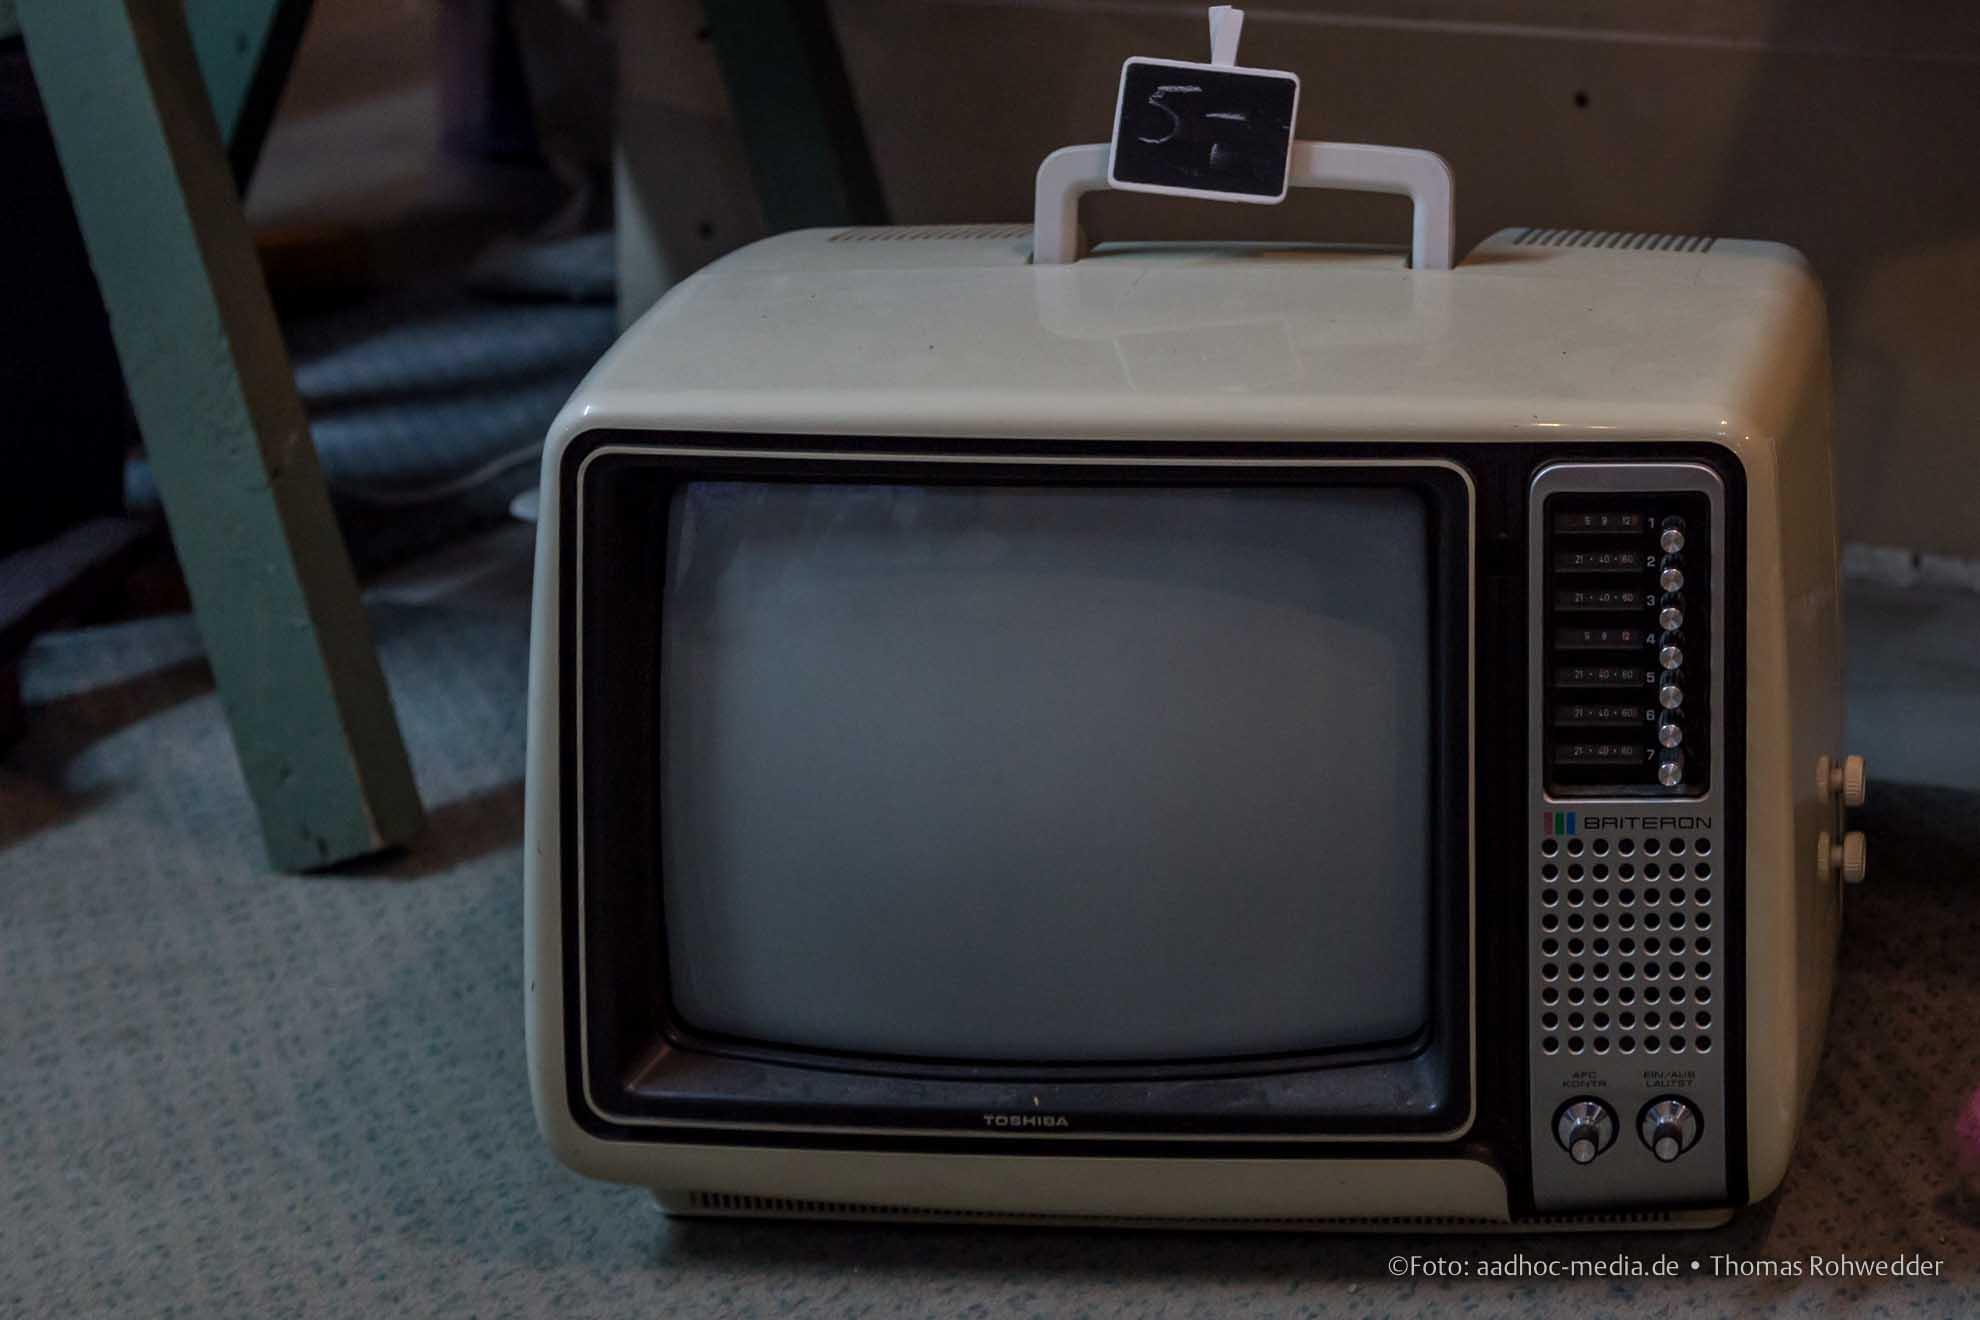 Toshiba Farb-TV